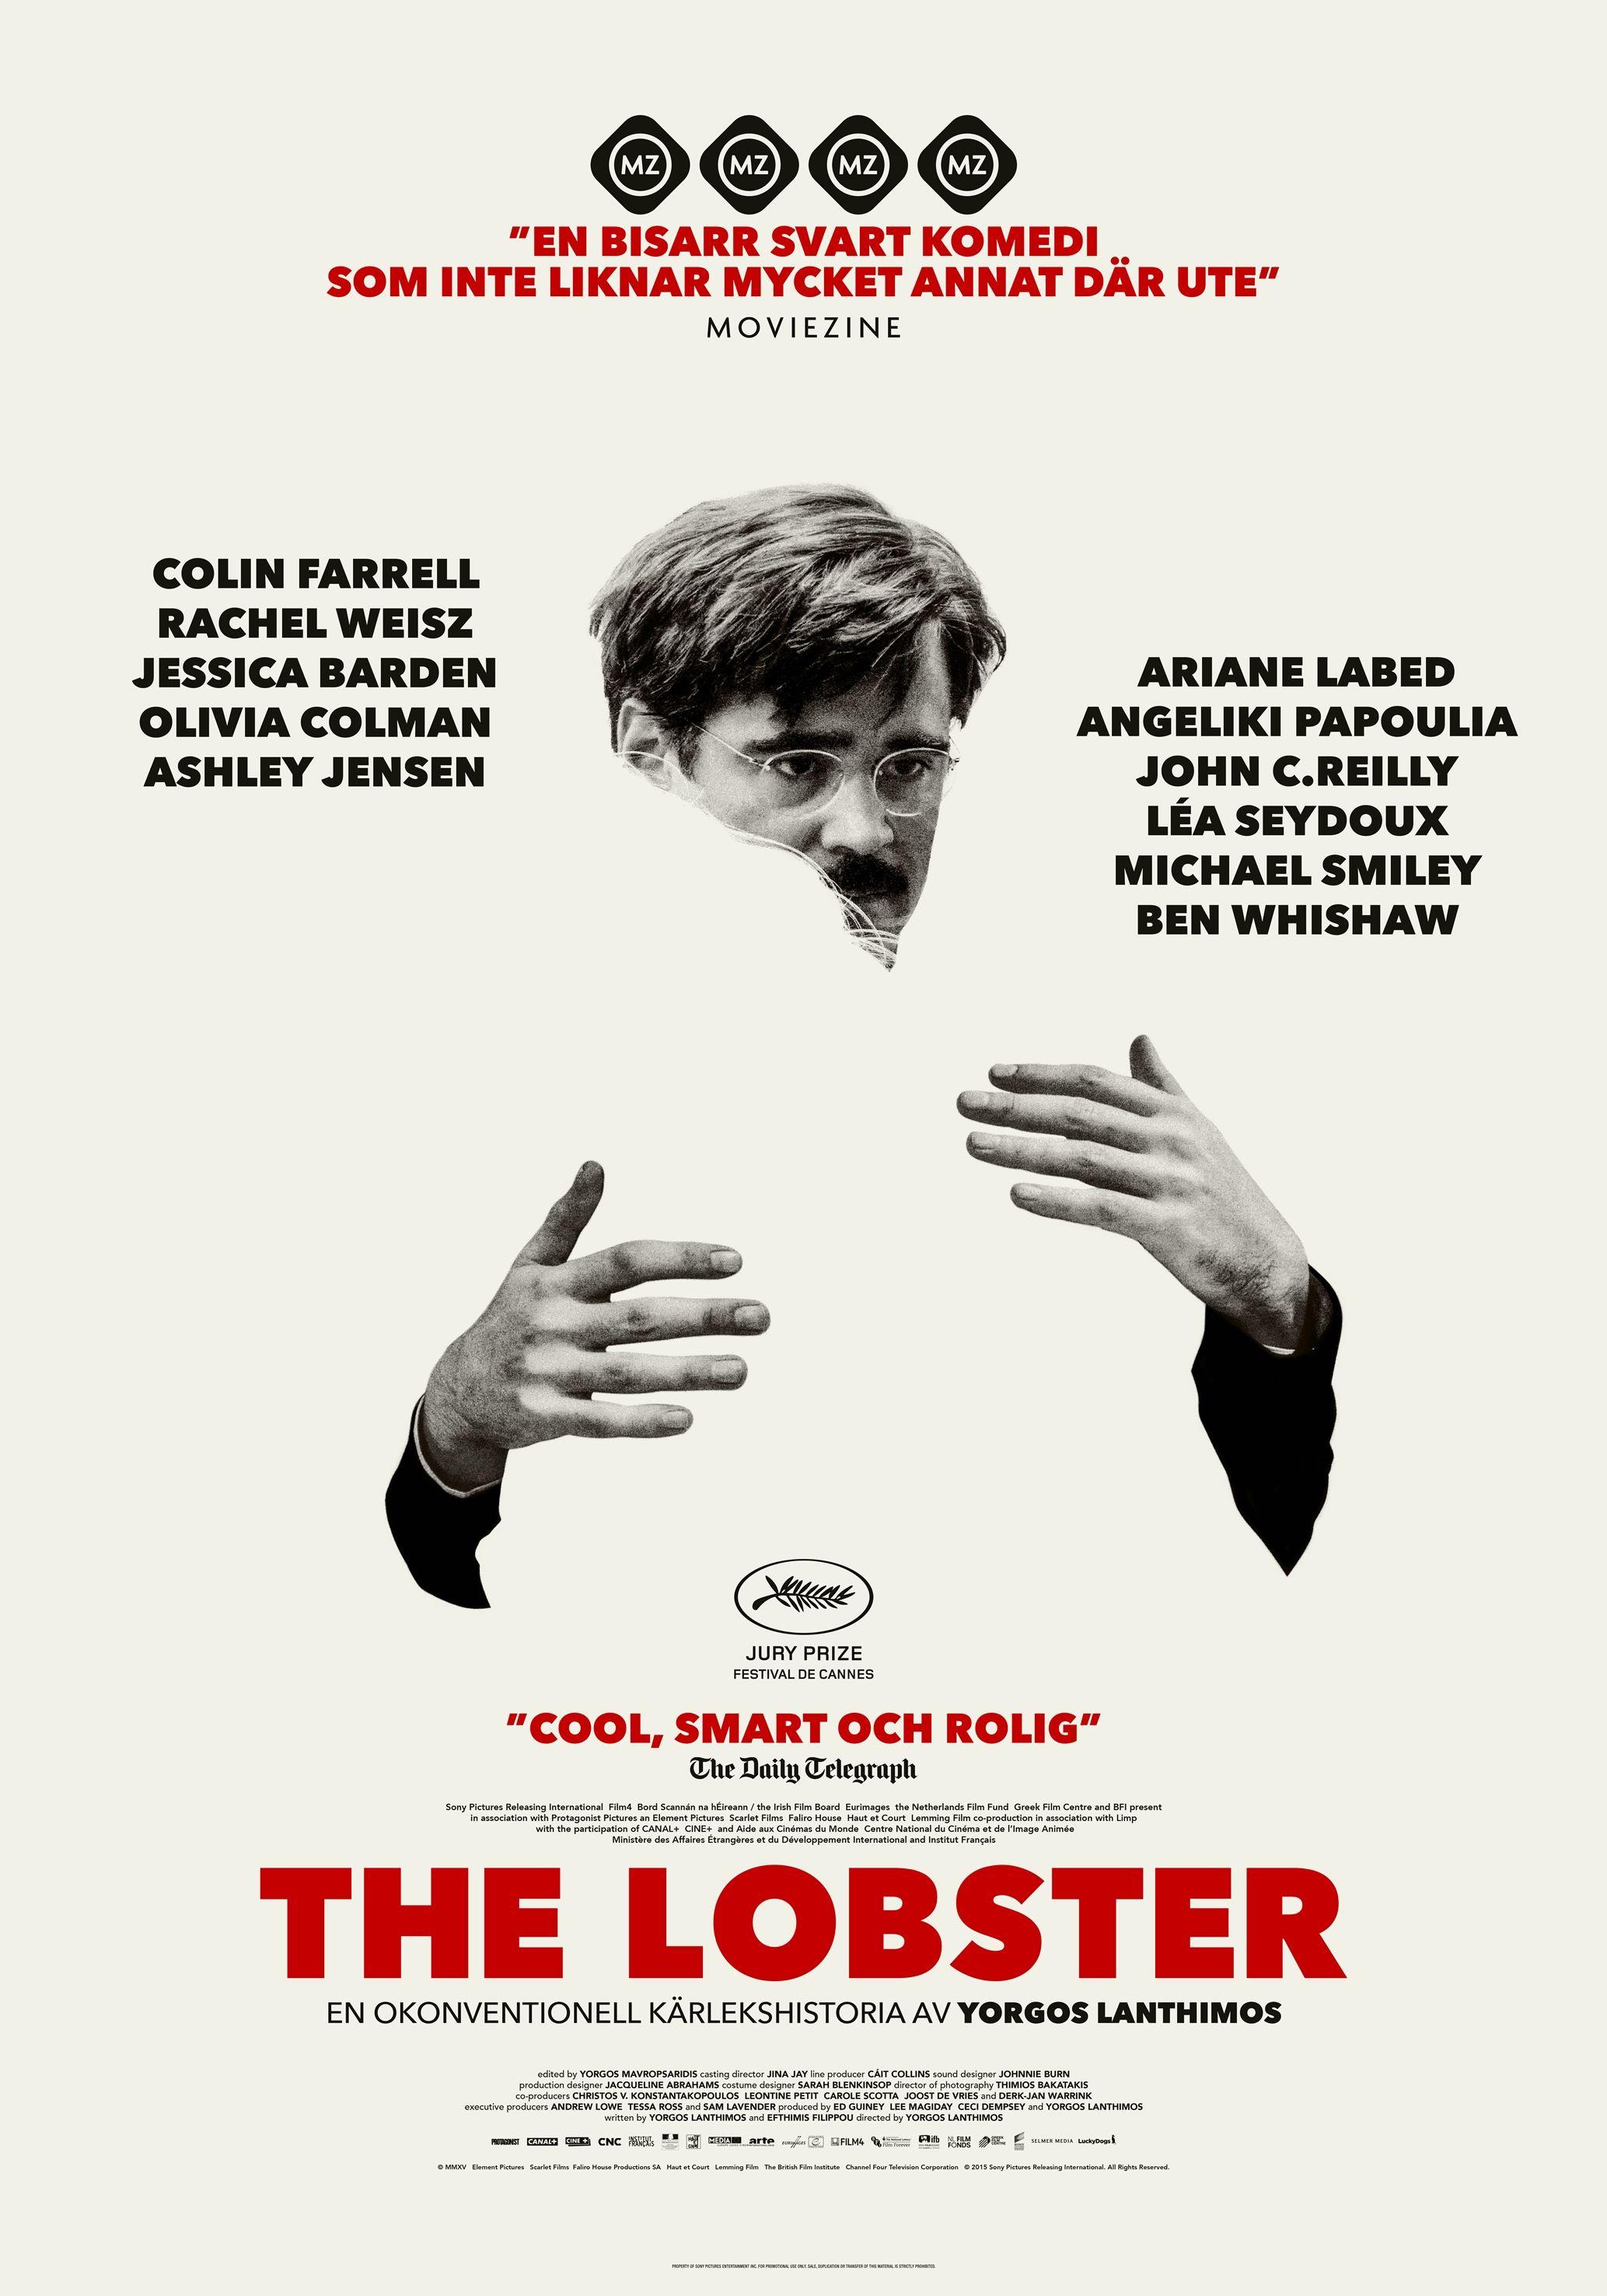 Bio: The Lobster